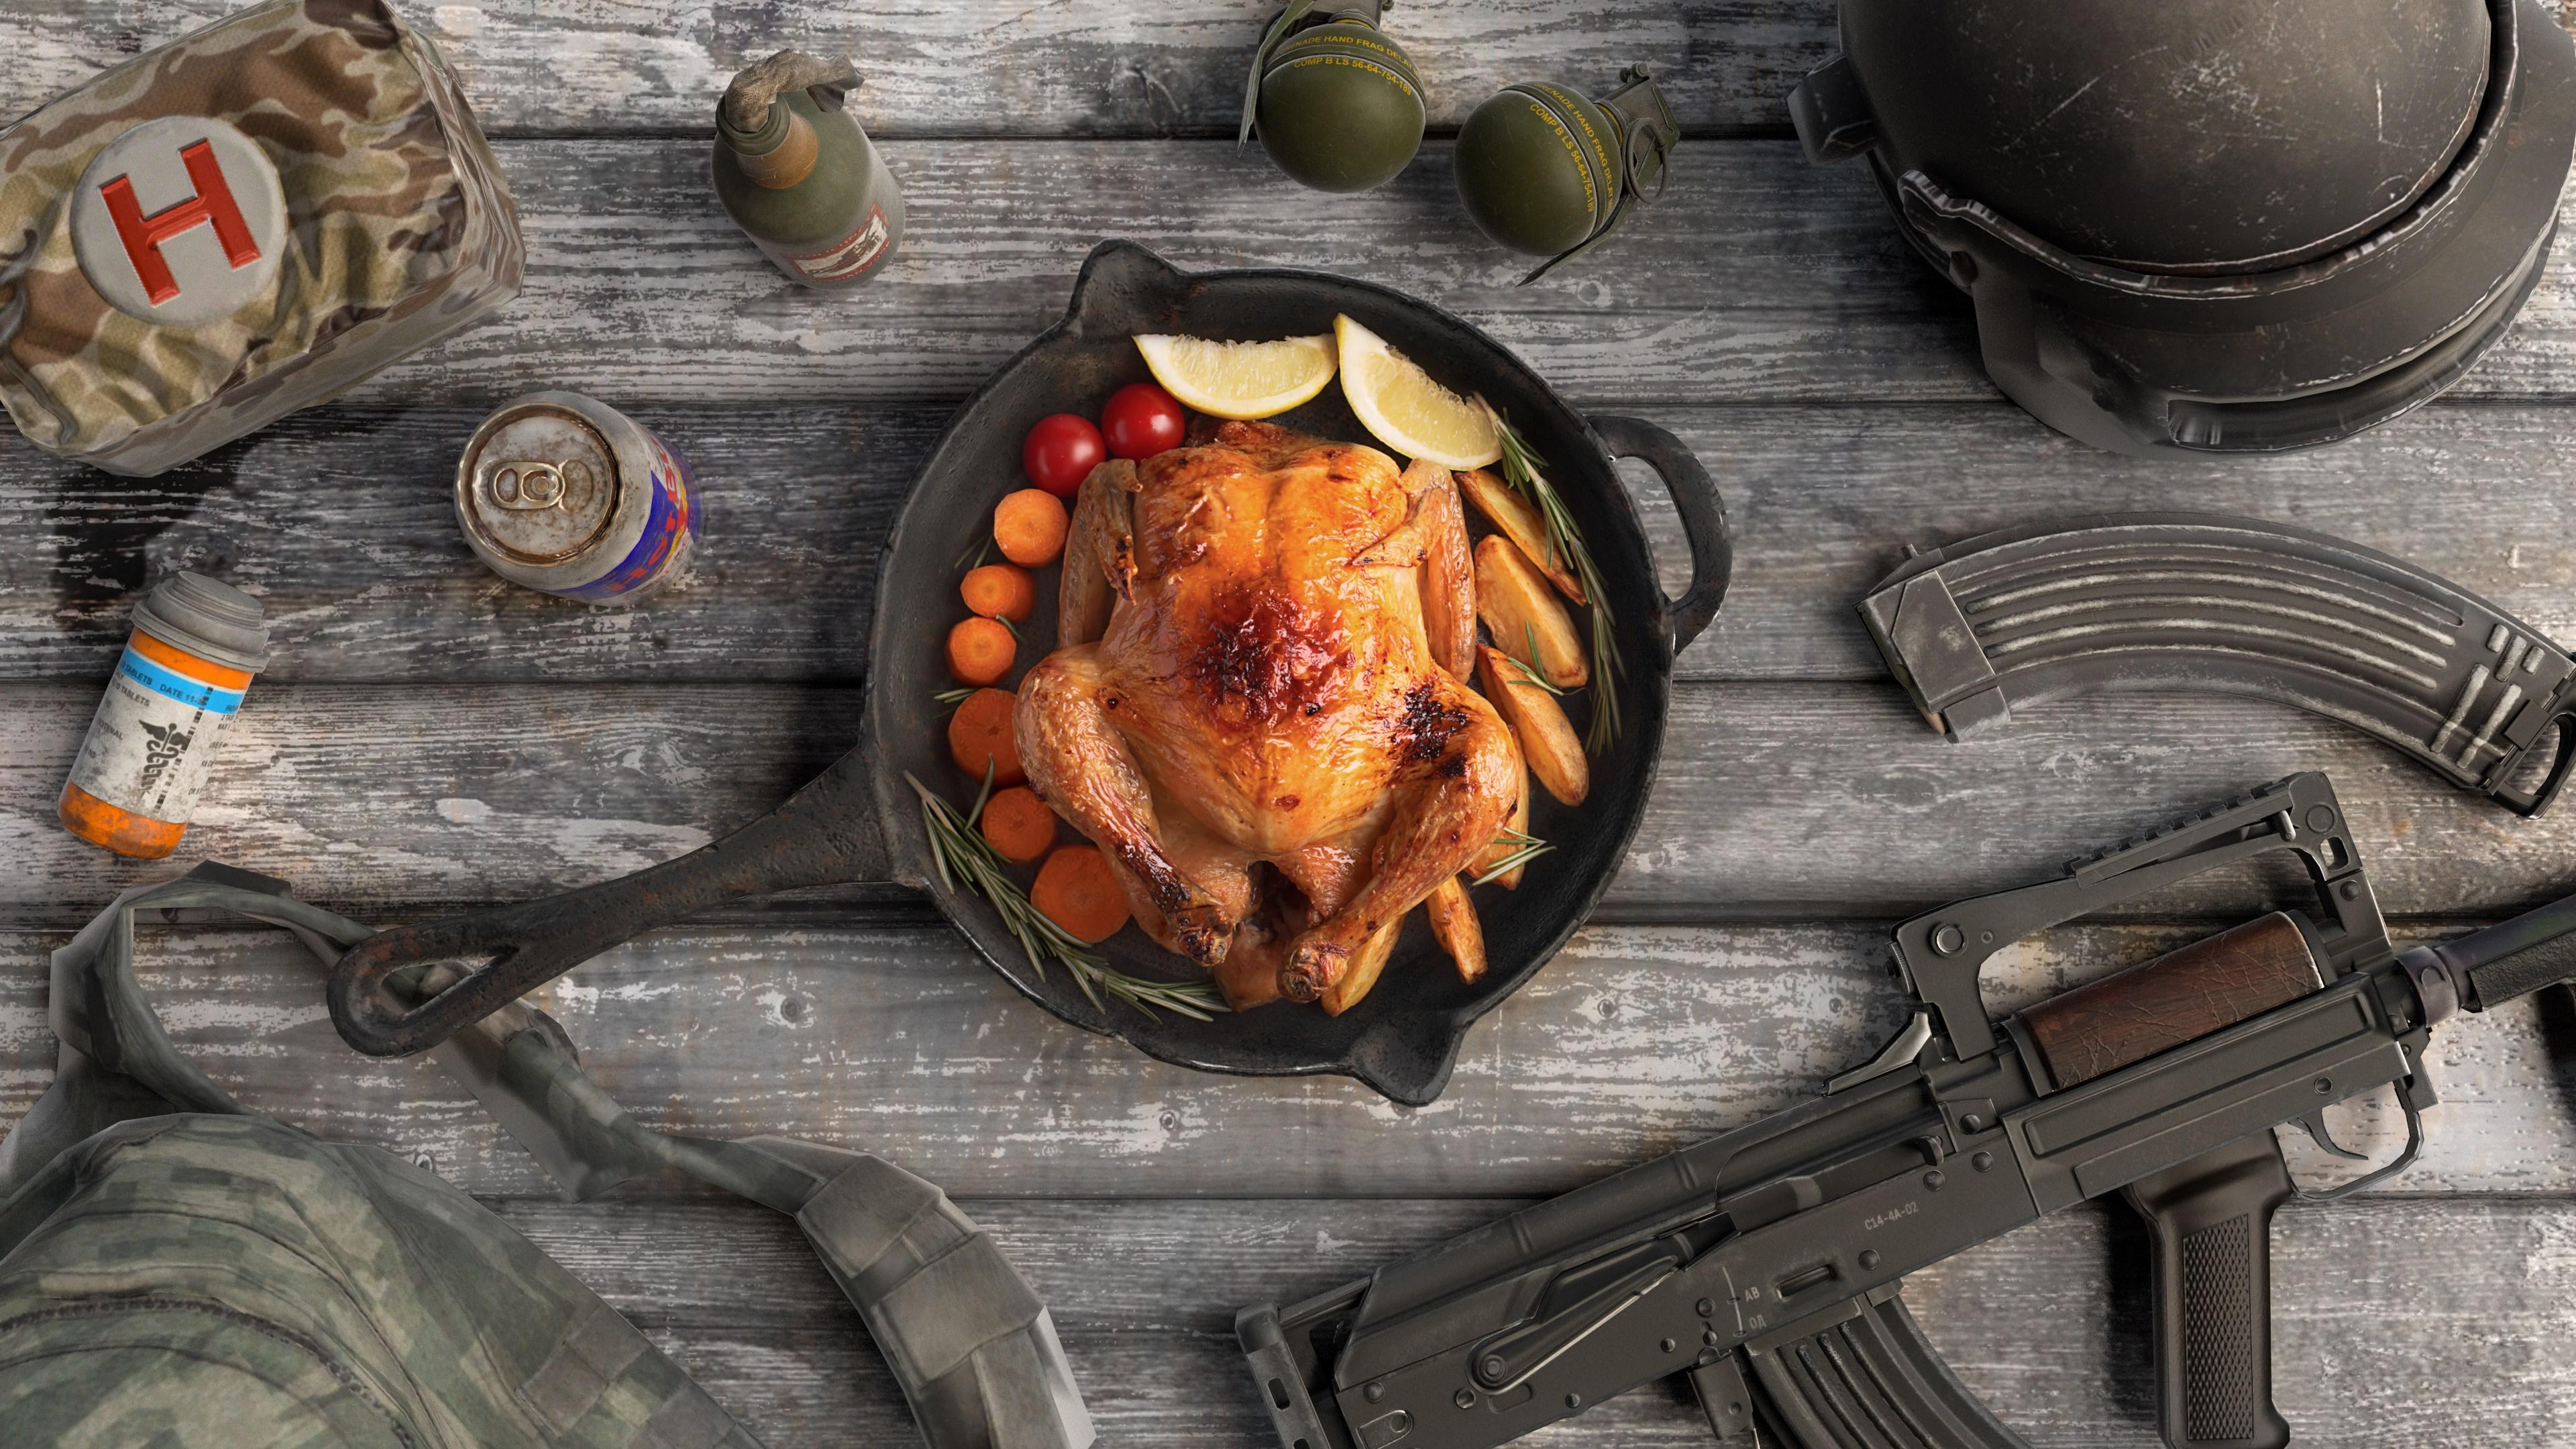 PUBG Chicken Dinner Wallpaper   PUBGHQ 3840x2160